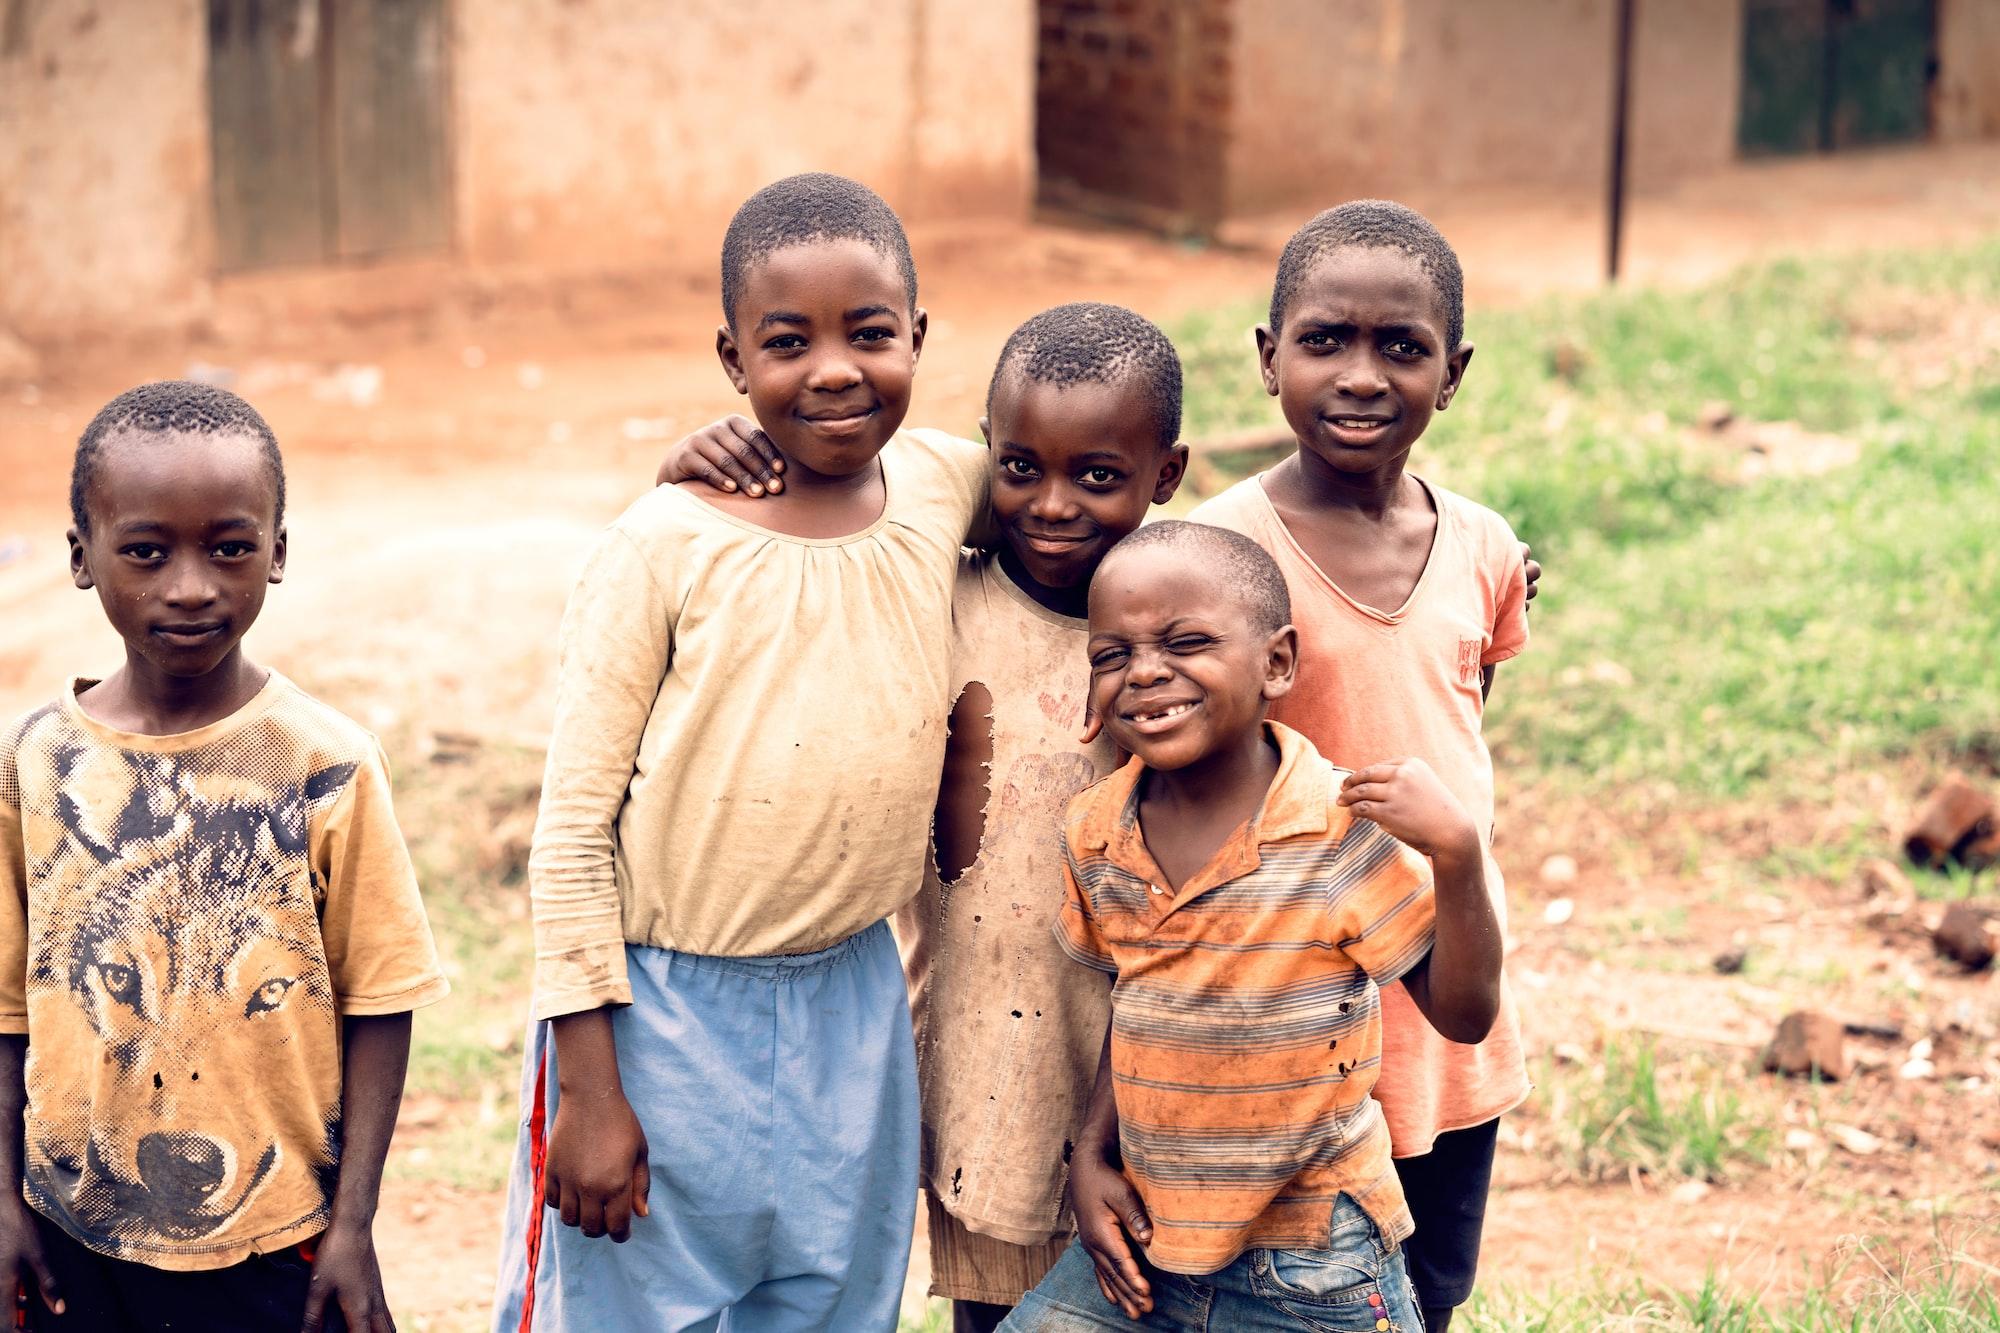 Laughing african children in the Ugandan village.